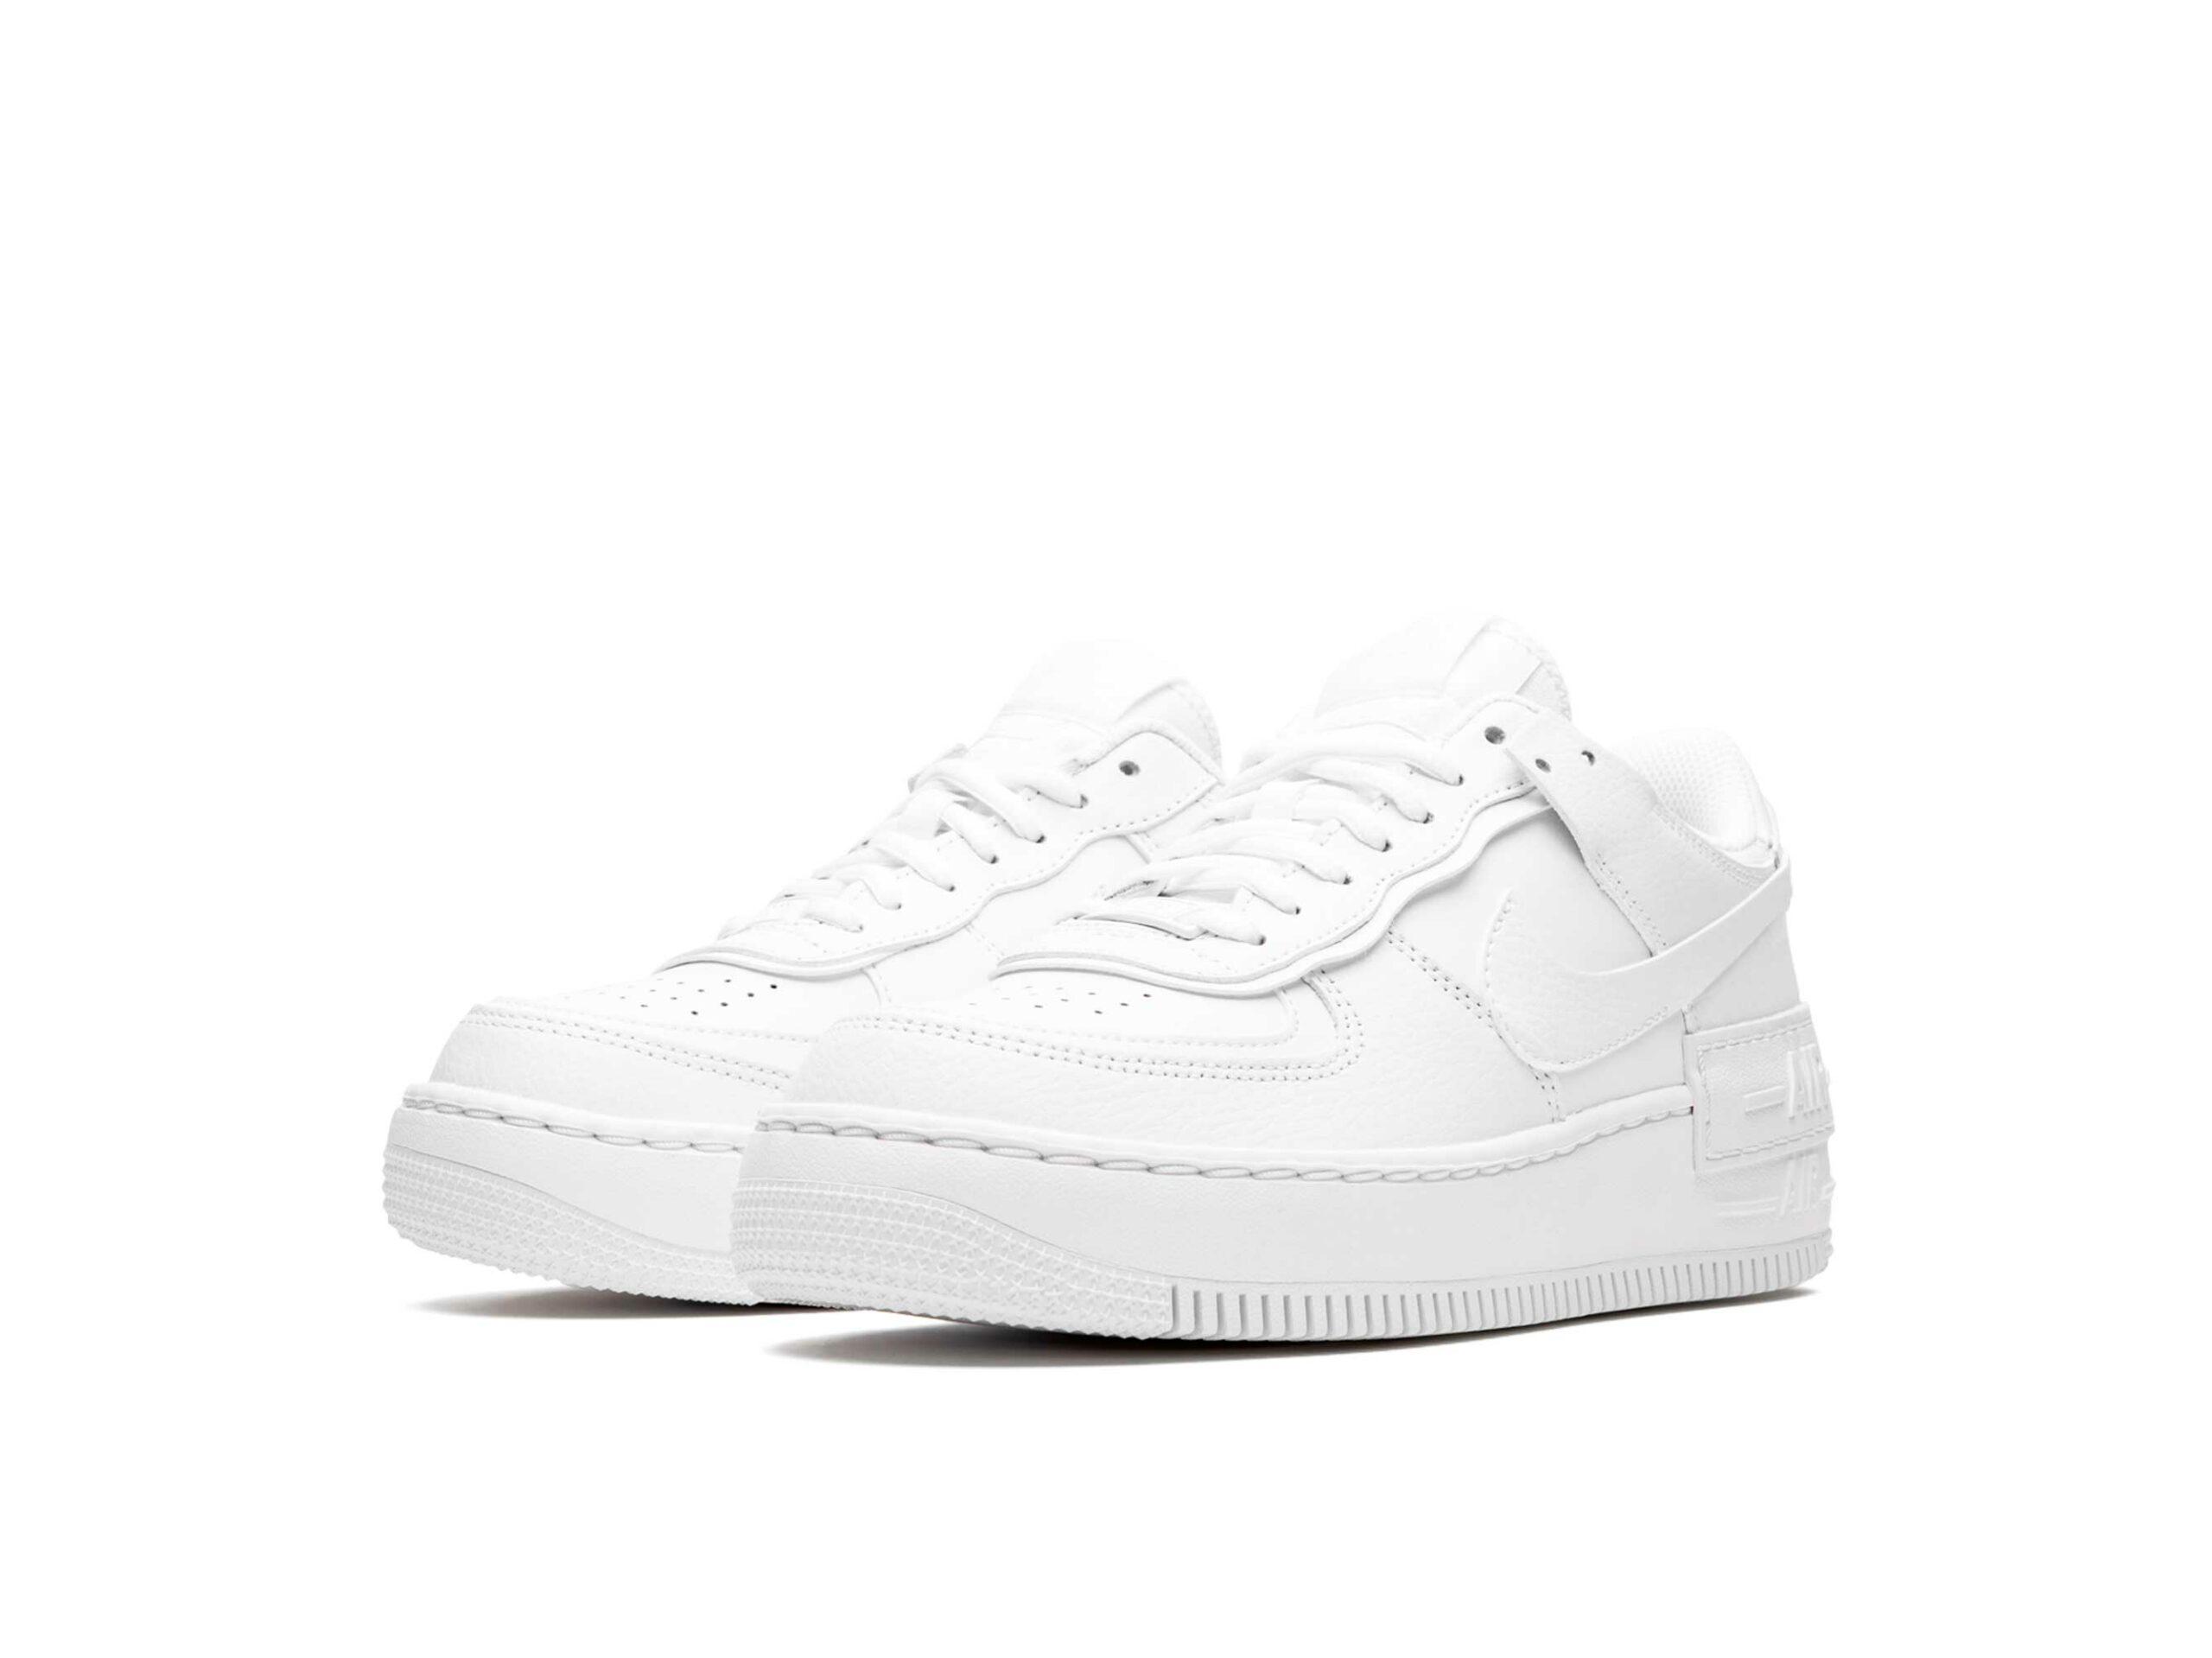 nike air force 1 shadow triple white CI0919_100 купить